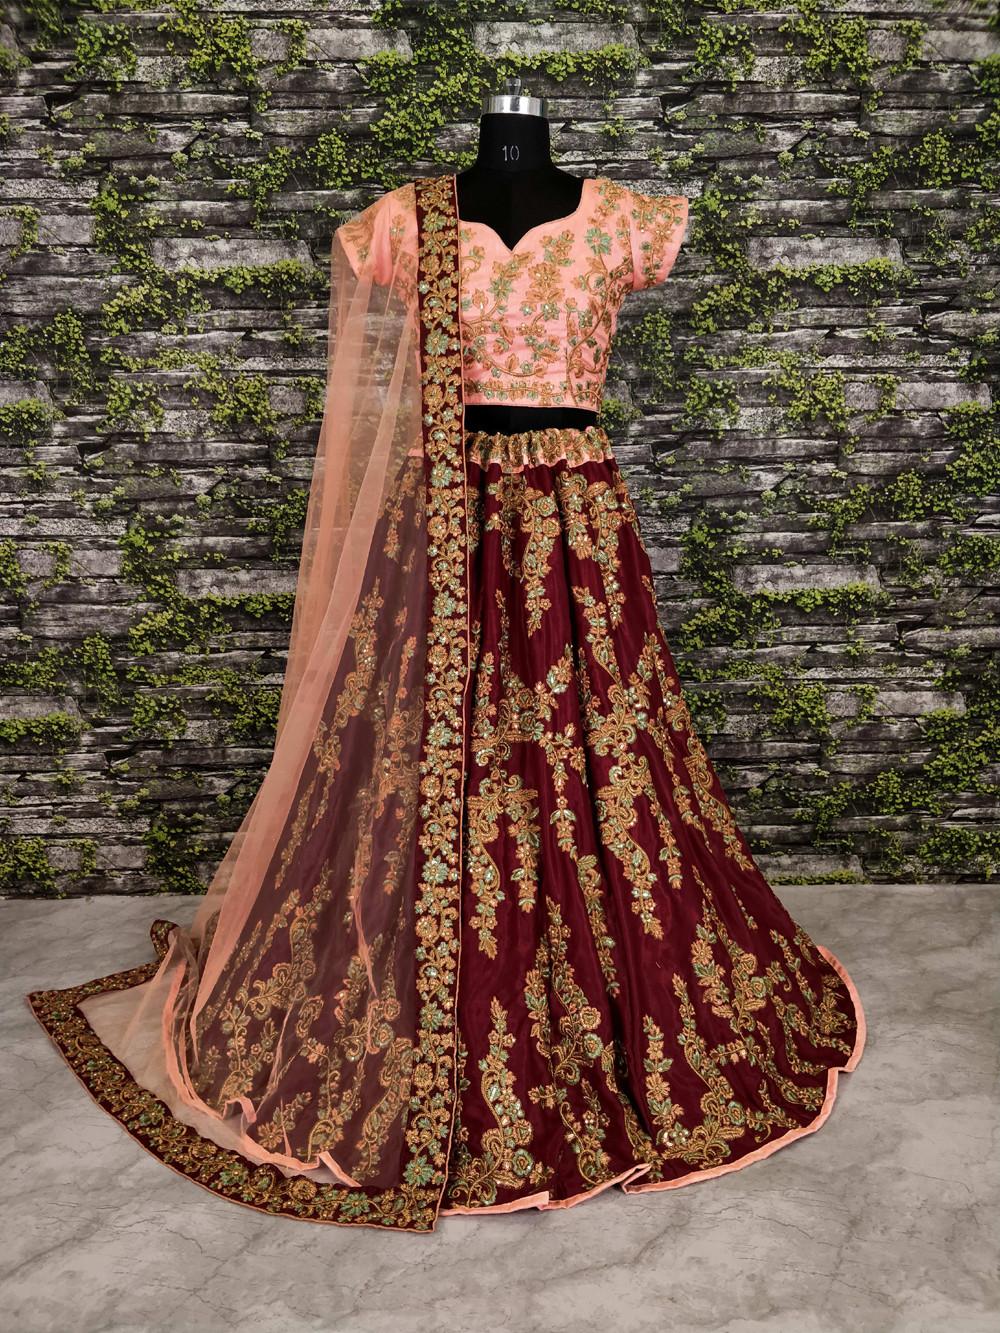 Presenting Maroon Color Velvet Wedding Wear Lehenga Choli